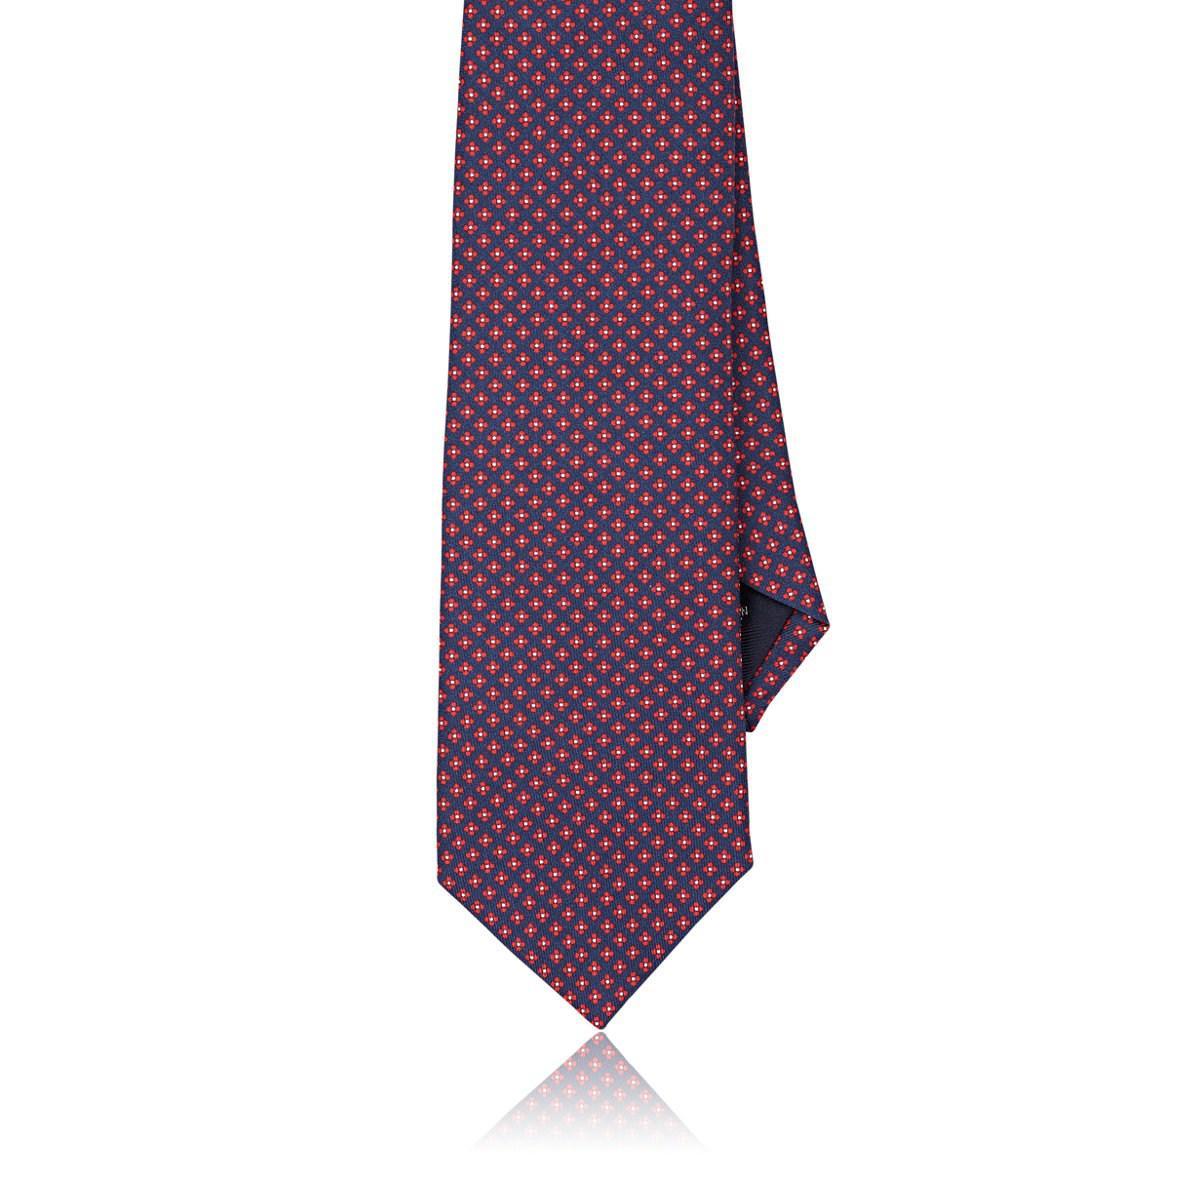 Mens Diamond-Pattern Silk Necktie Paolo Albizzati kpEfrE0KJ5